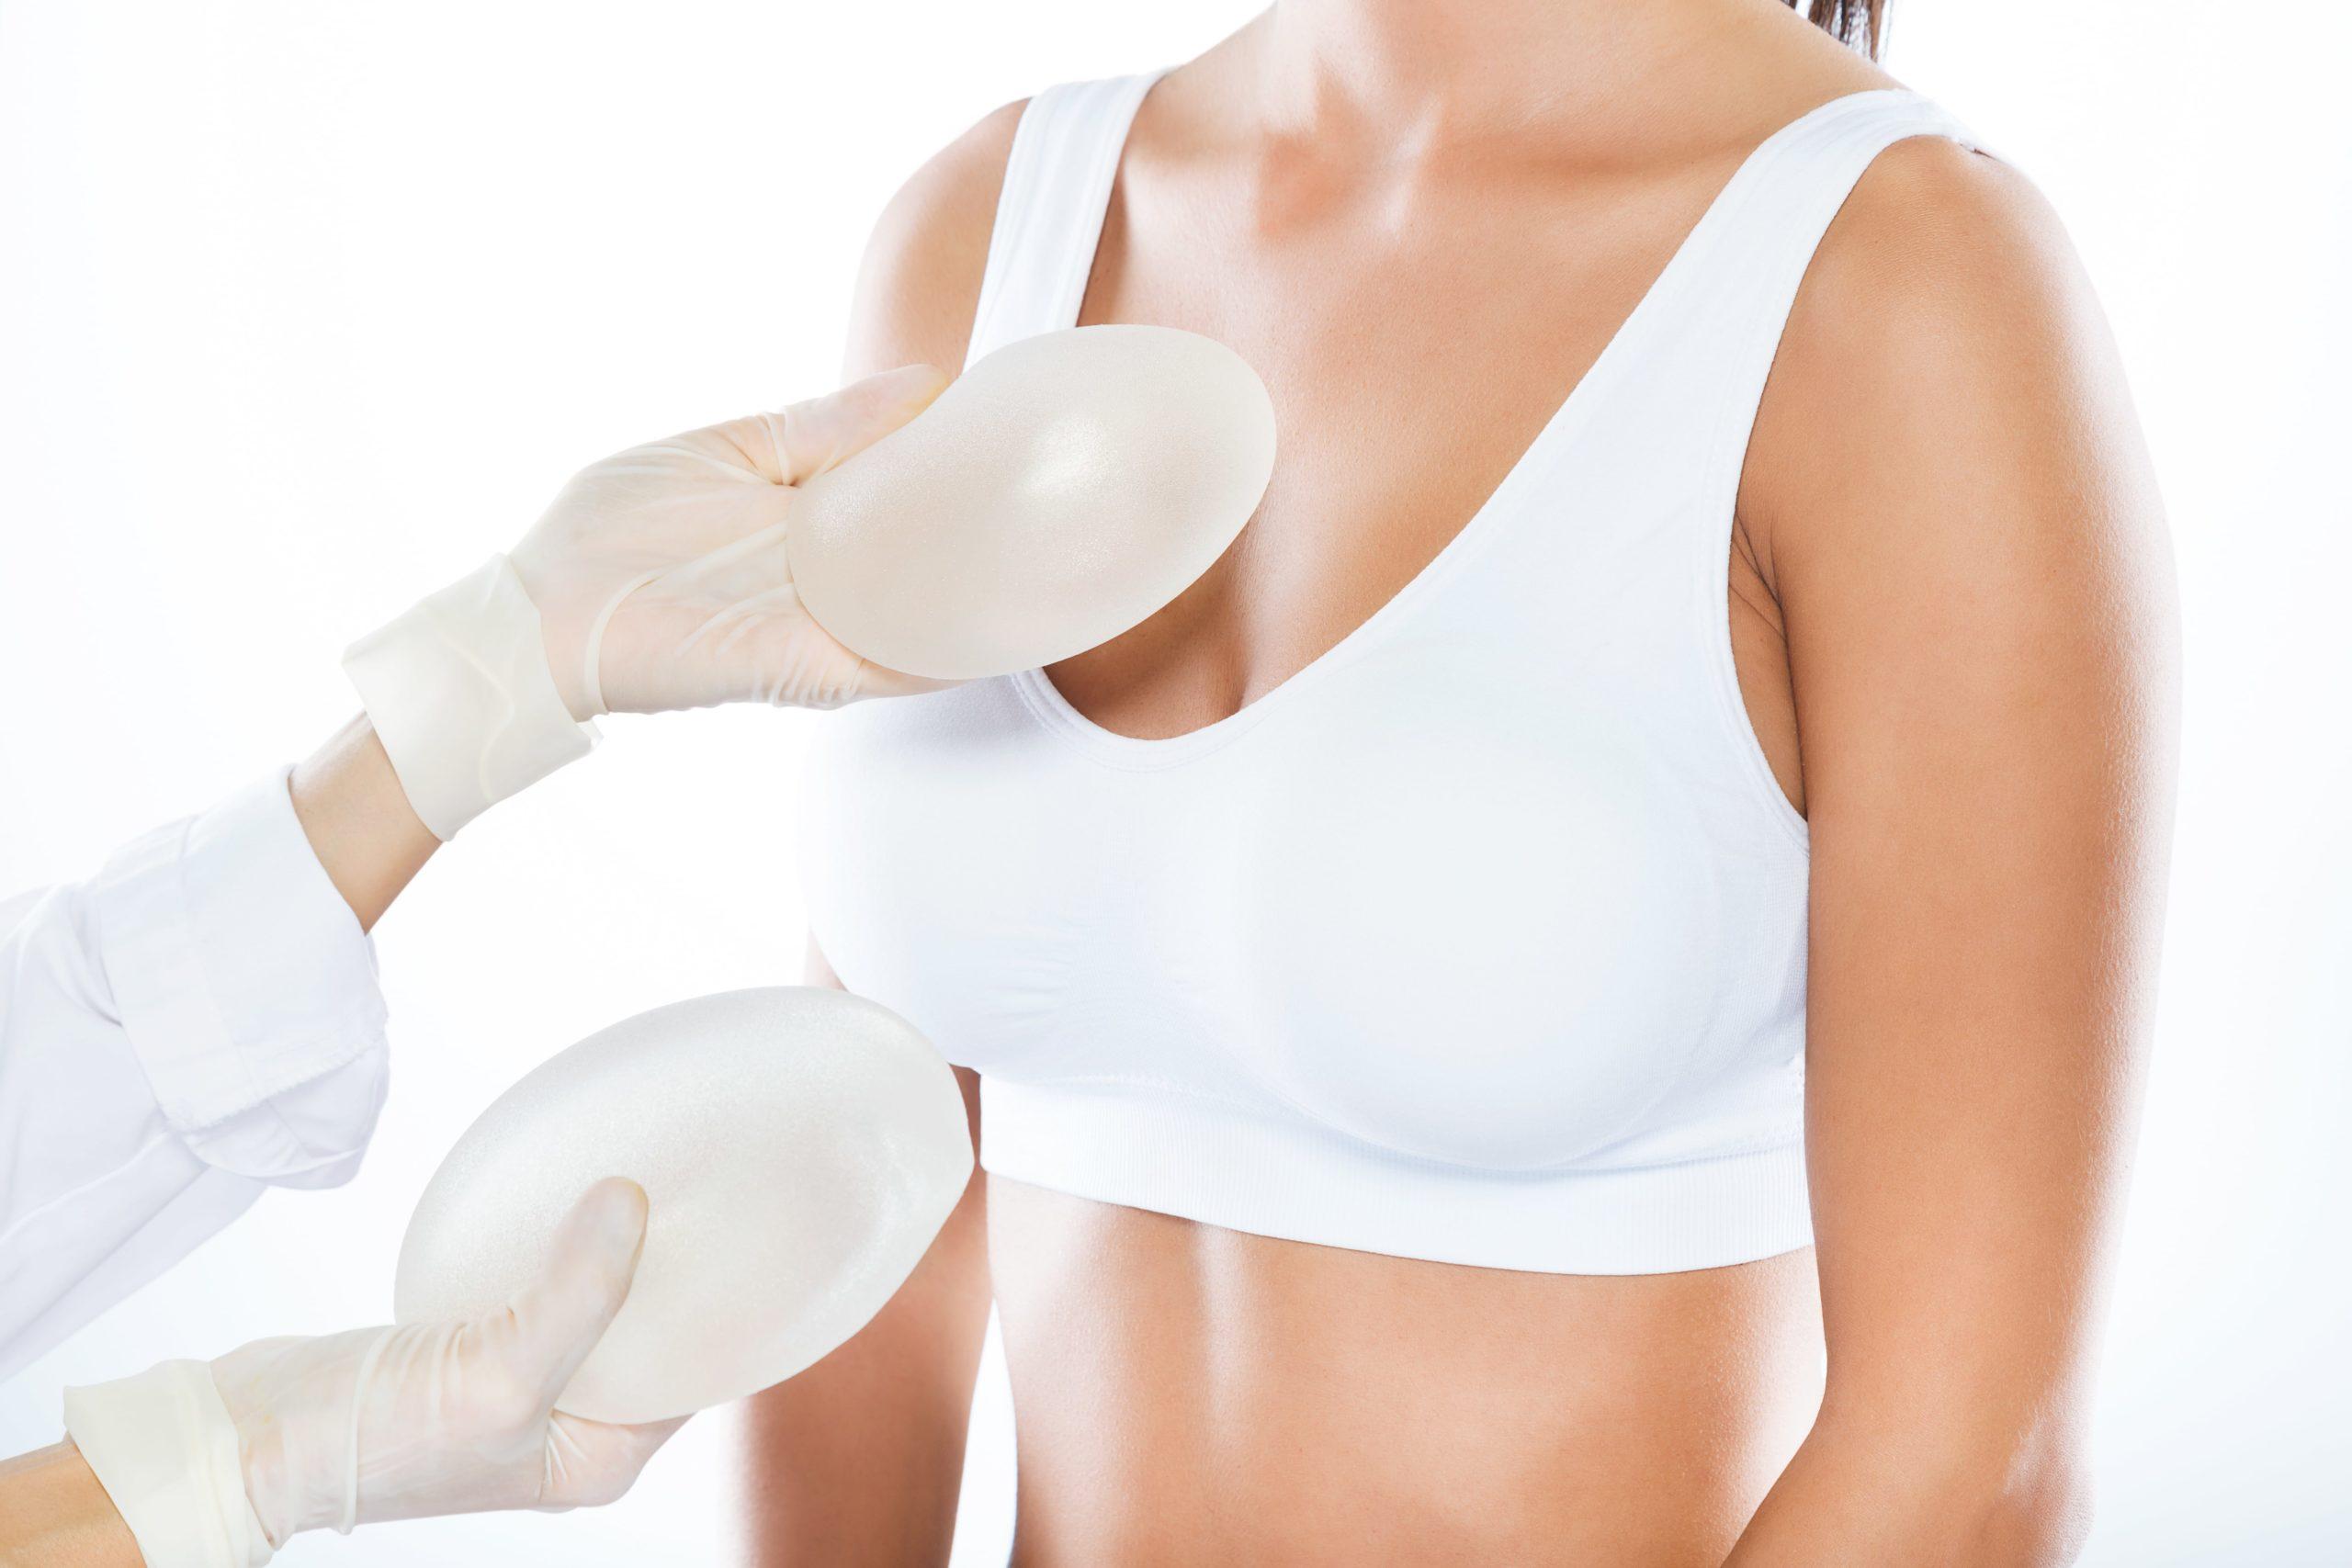 breast augmentation of women, breast enhancement of women